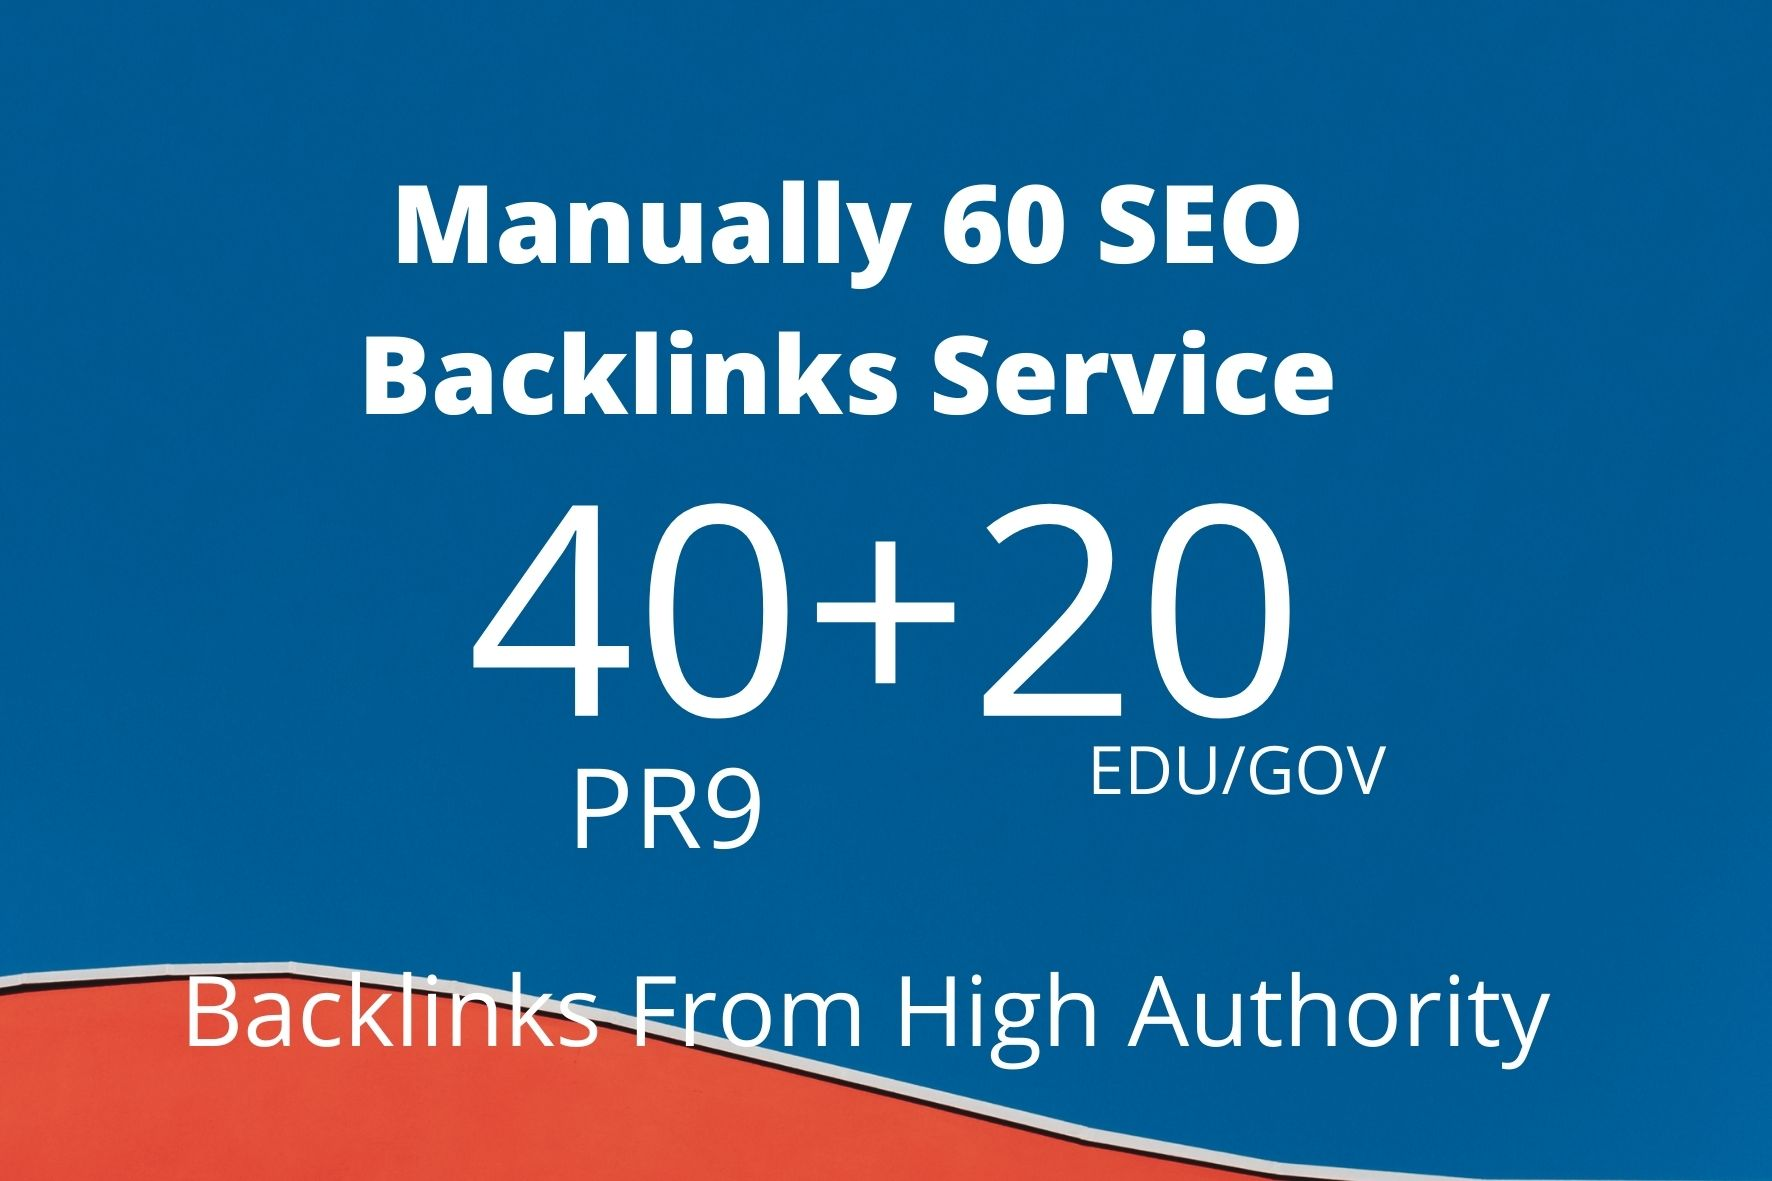 Manually 40pr9& 20Edu/Gov SEO Backlinks